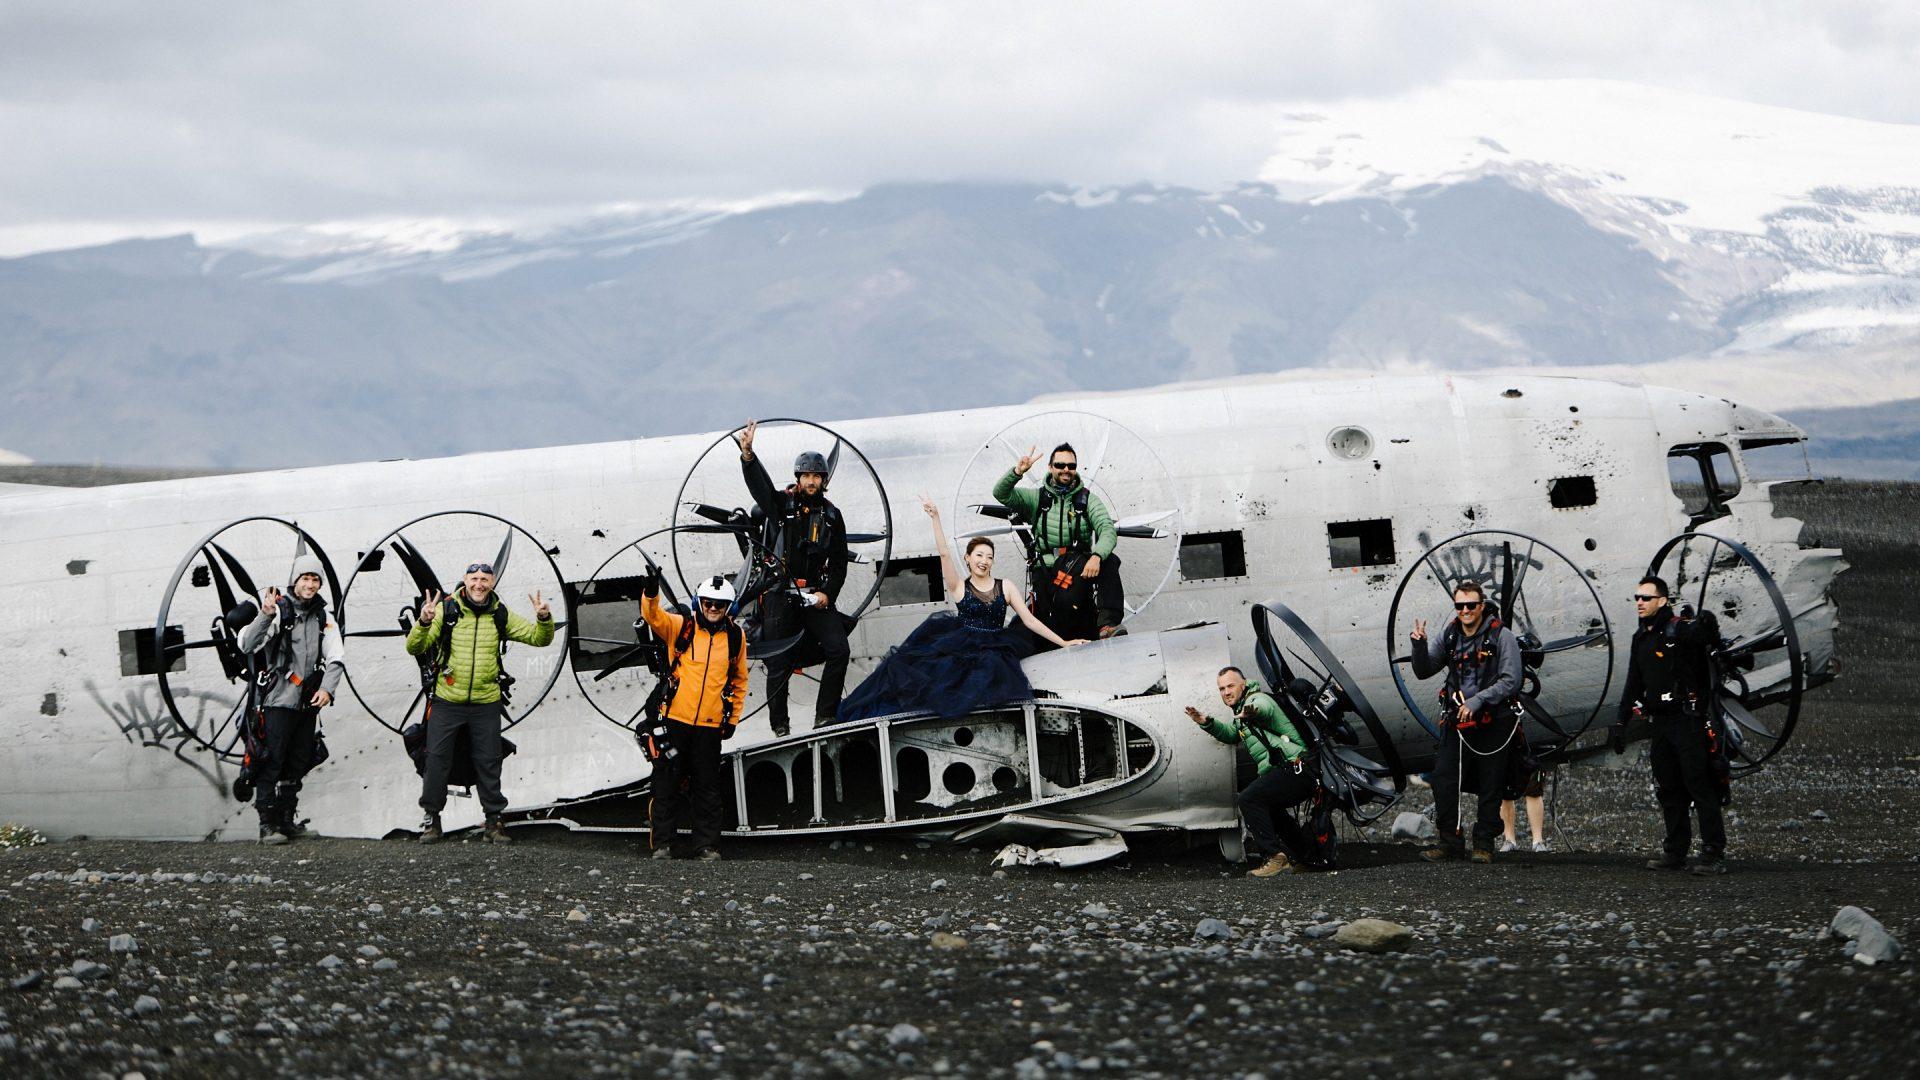 Scout_Team_Iceland-143-Custom-1920x1080